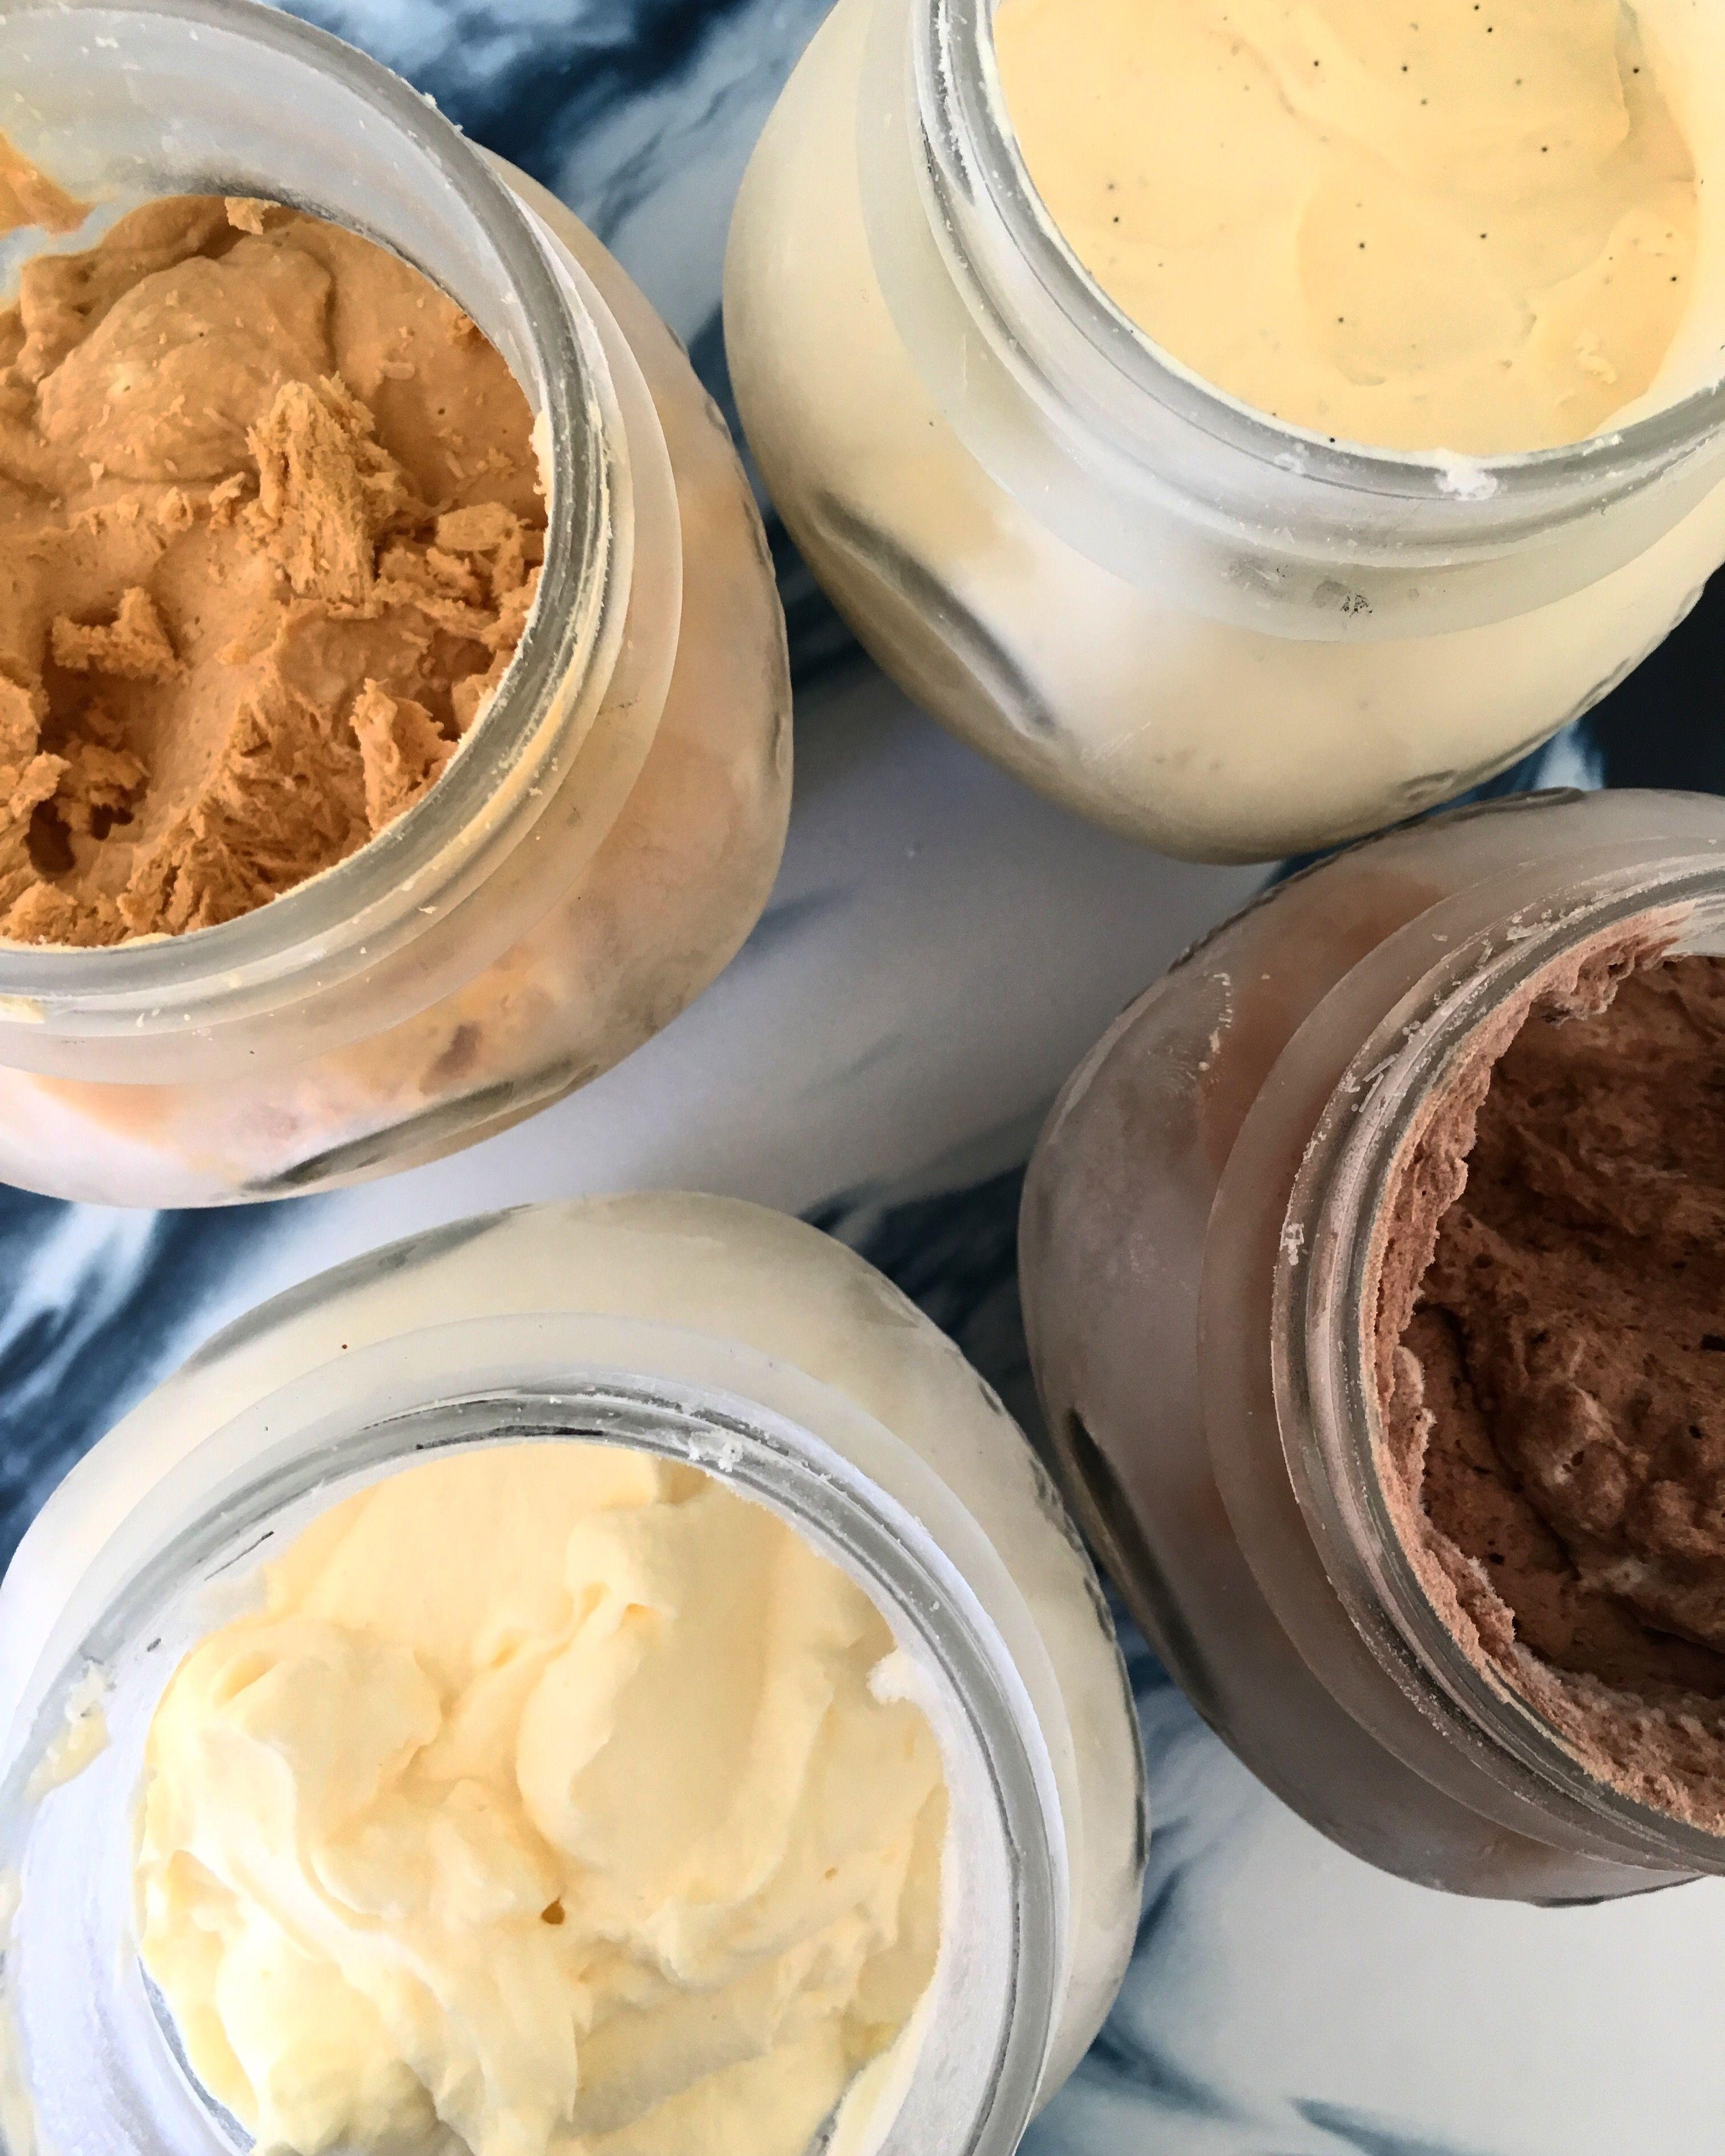 Mason Jar Ice Cream! #ketoicecream